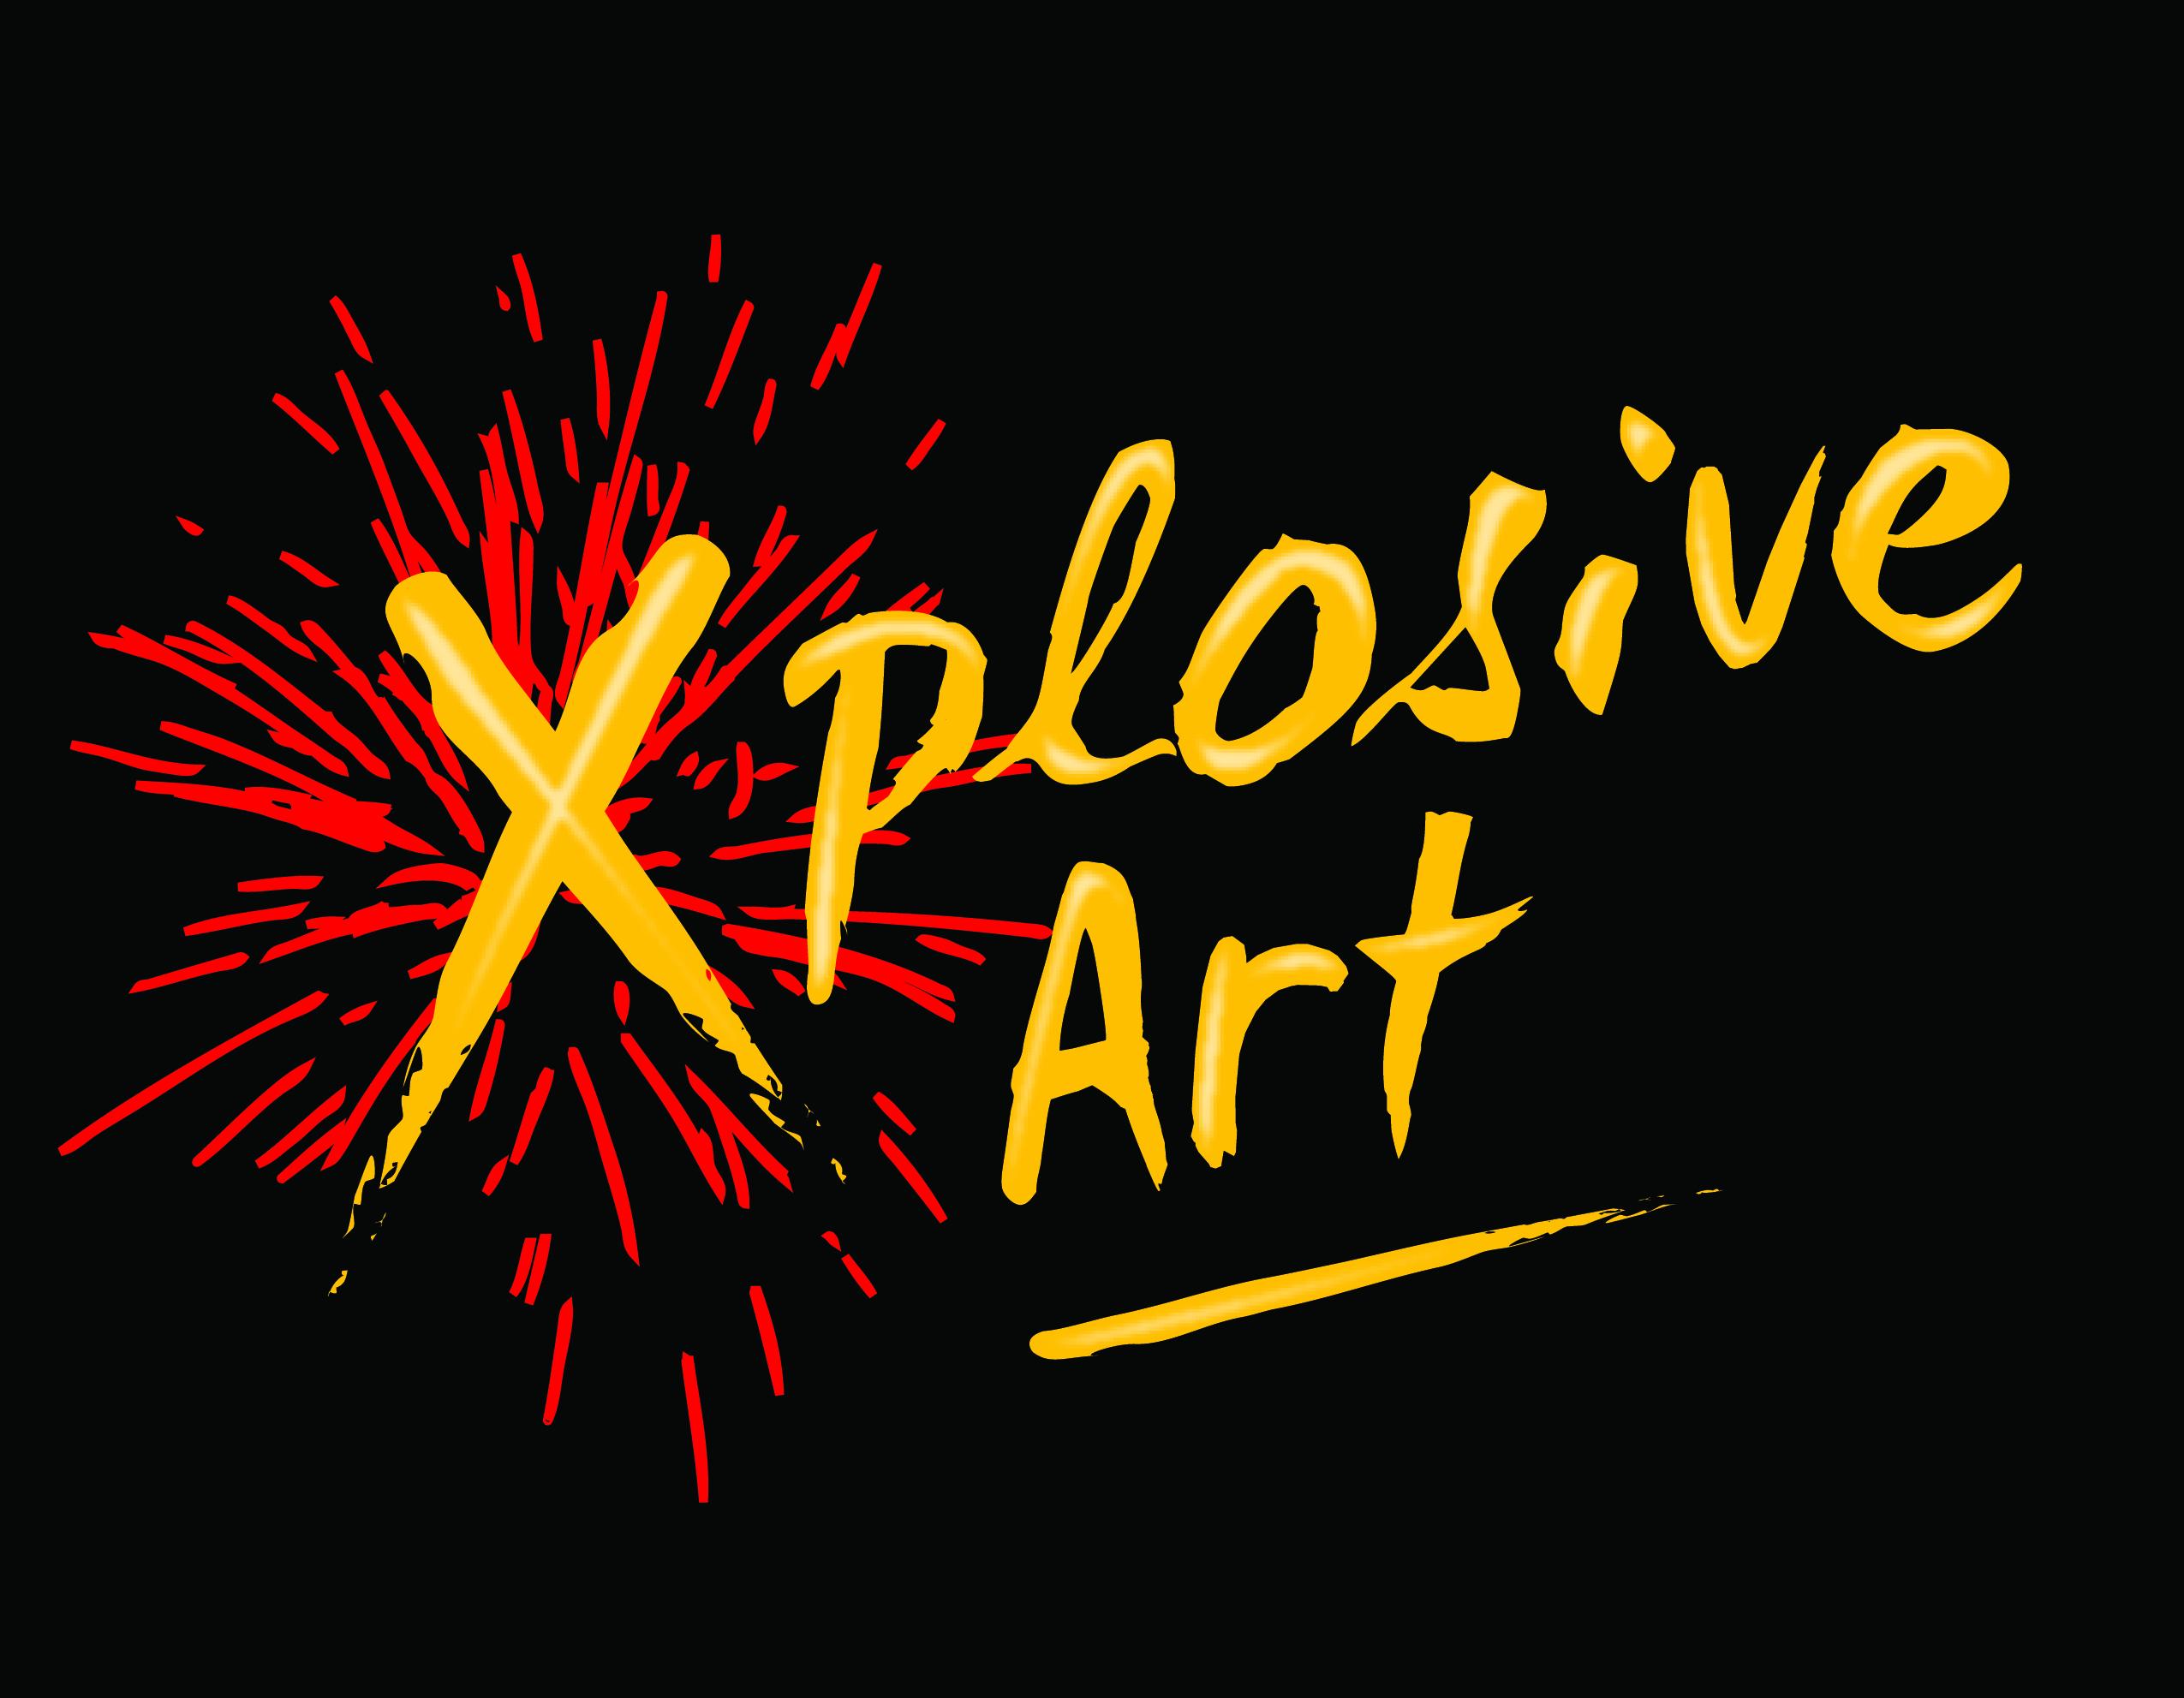 Xplosive Art